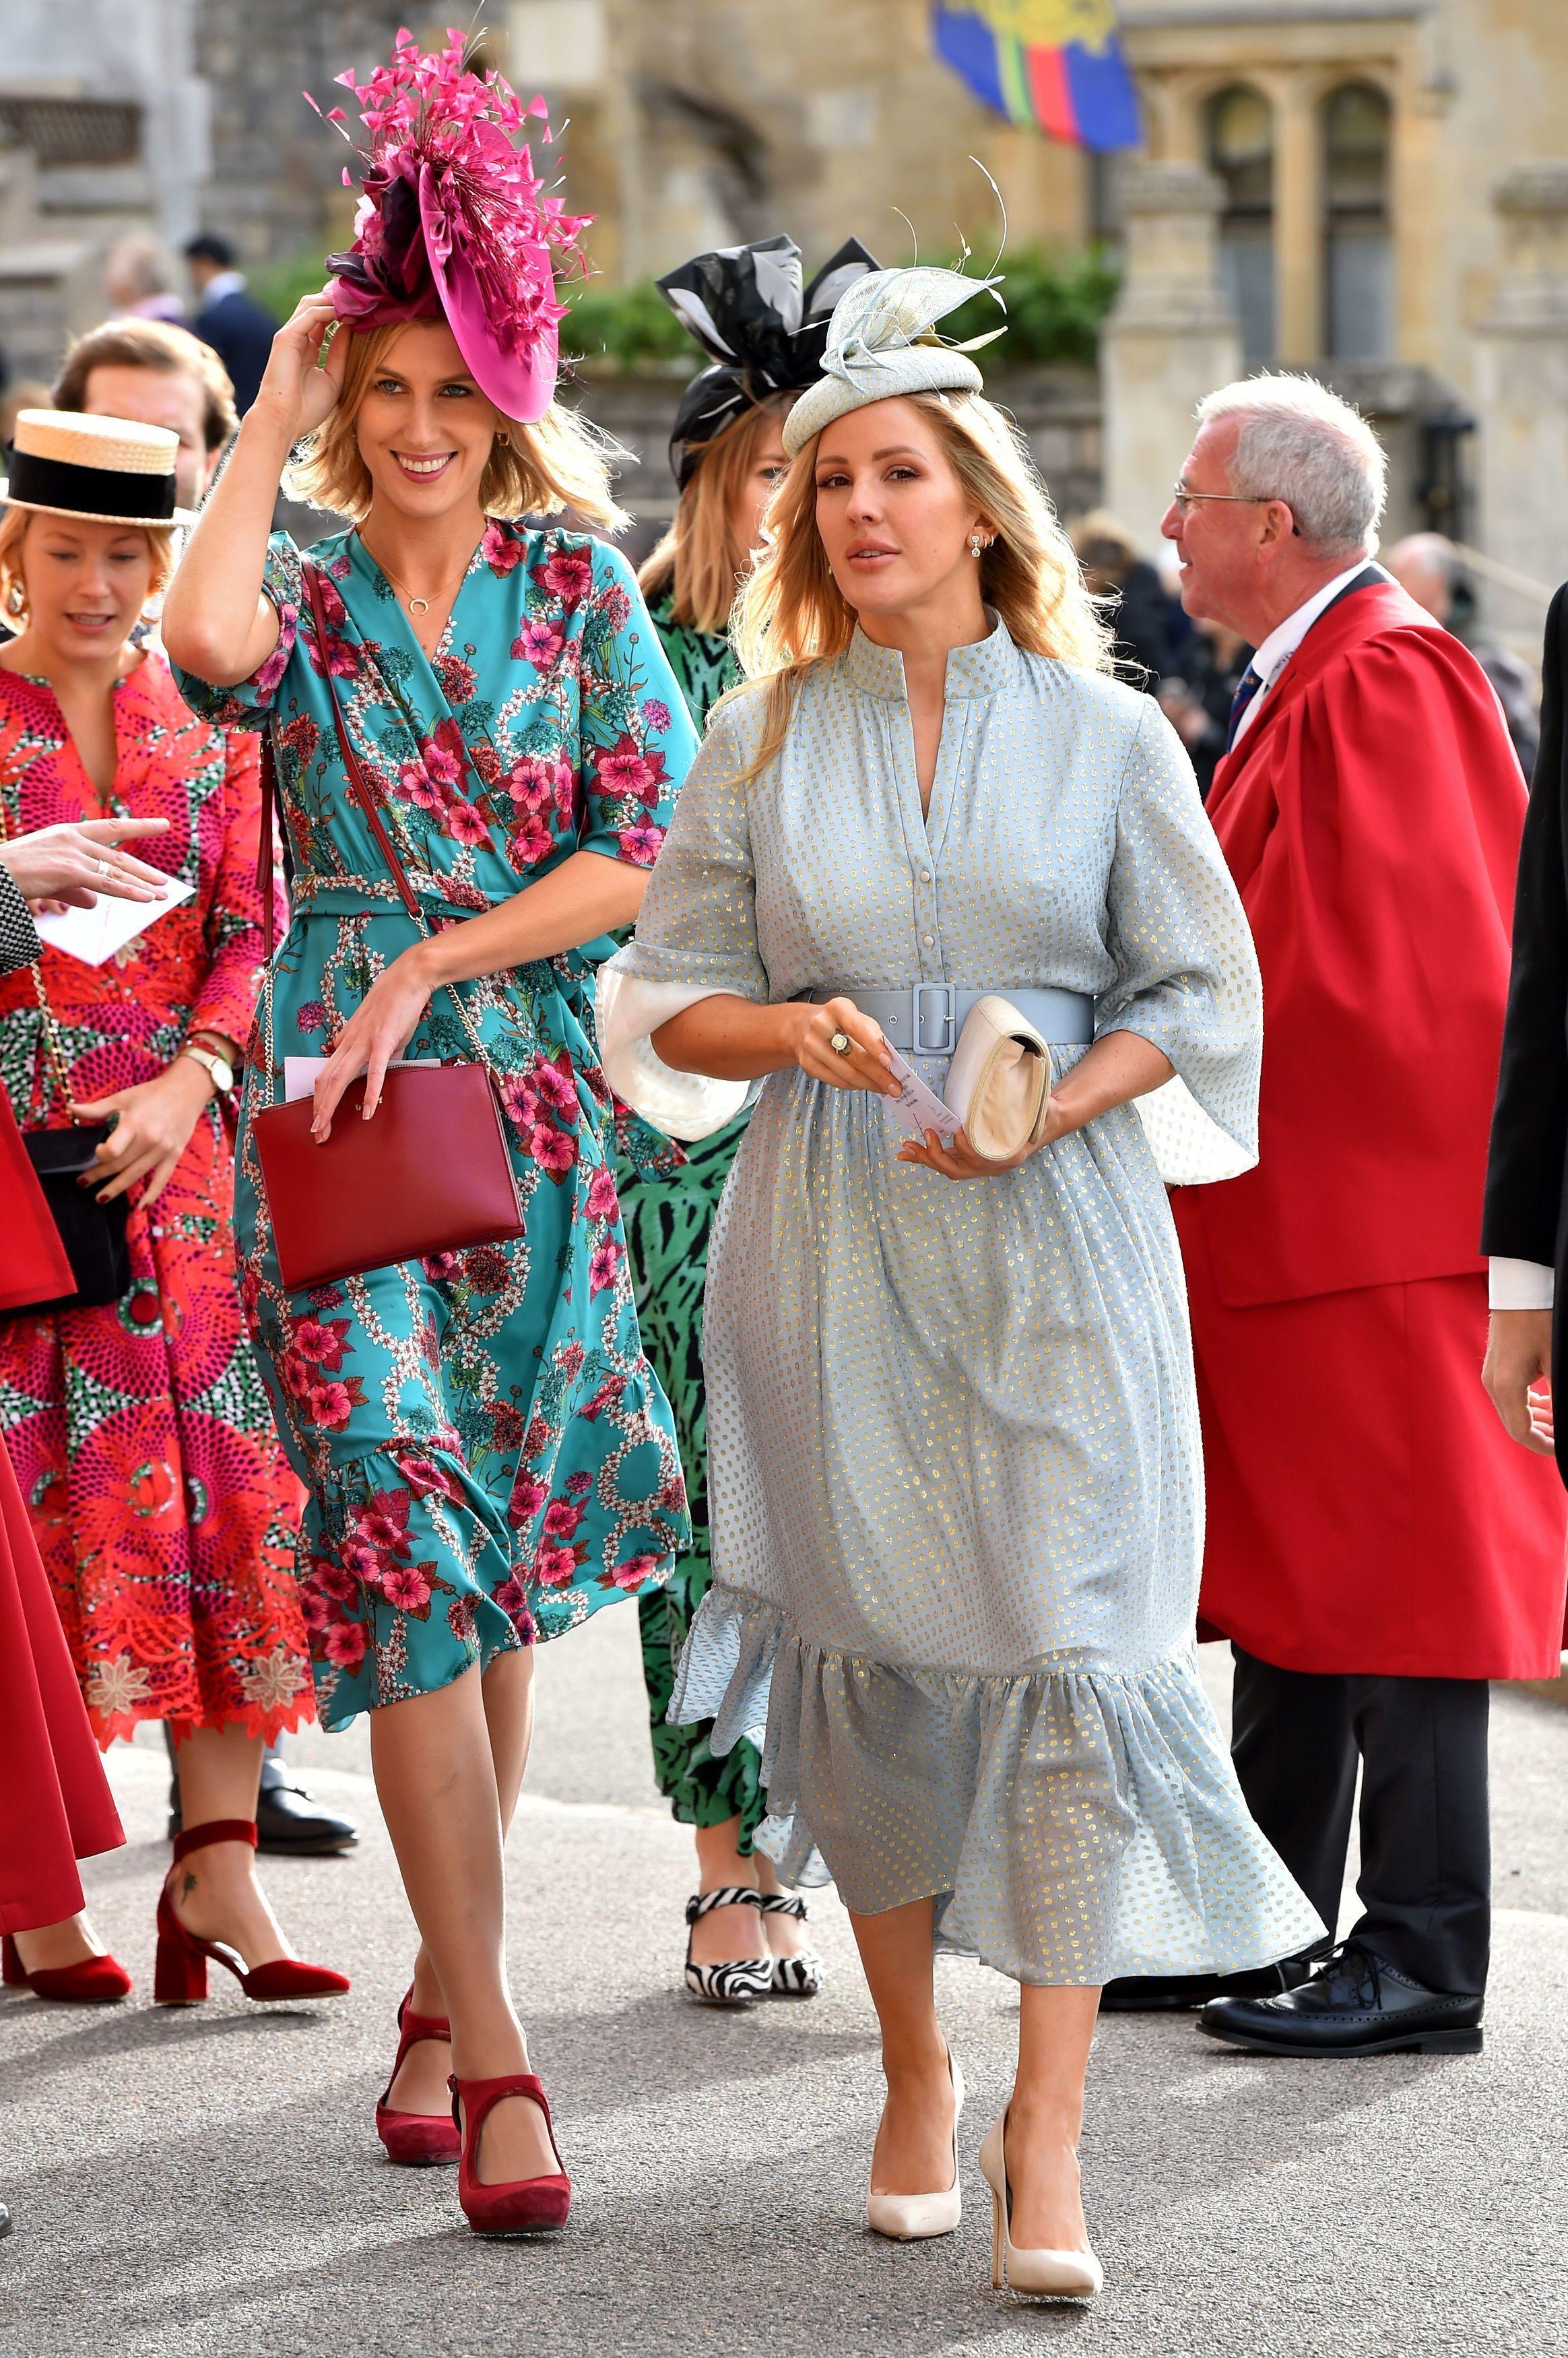 Ellie Goulding arrives for the wedding of Princess Eugenie and Jack Brooksbank at St George's Chapel at  Windsor Castle on Oct. 12, 2018.